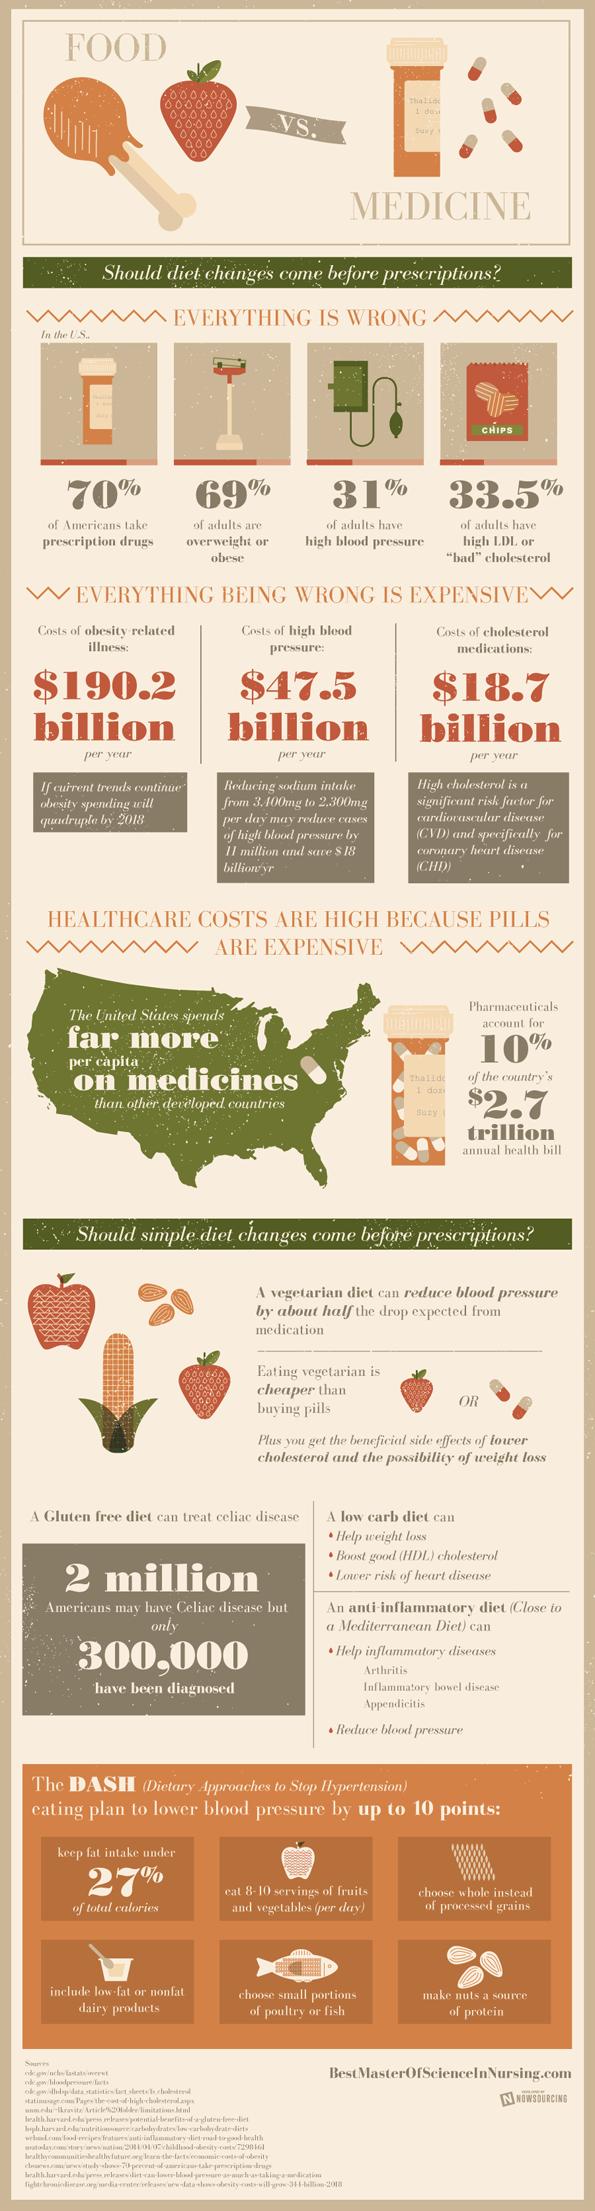 food_vs_medicine